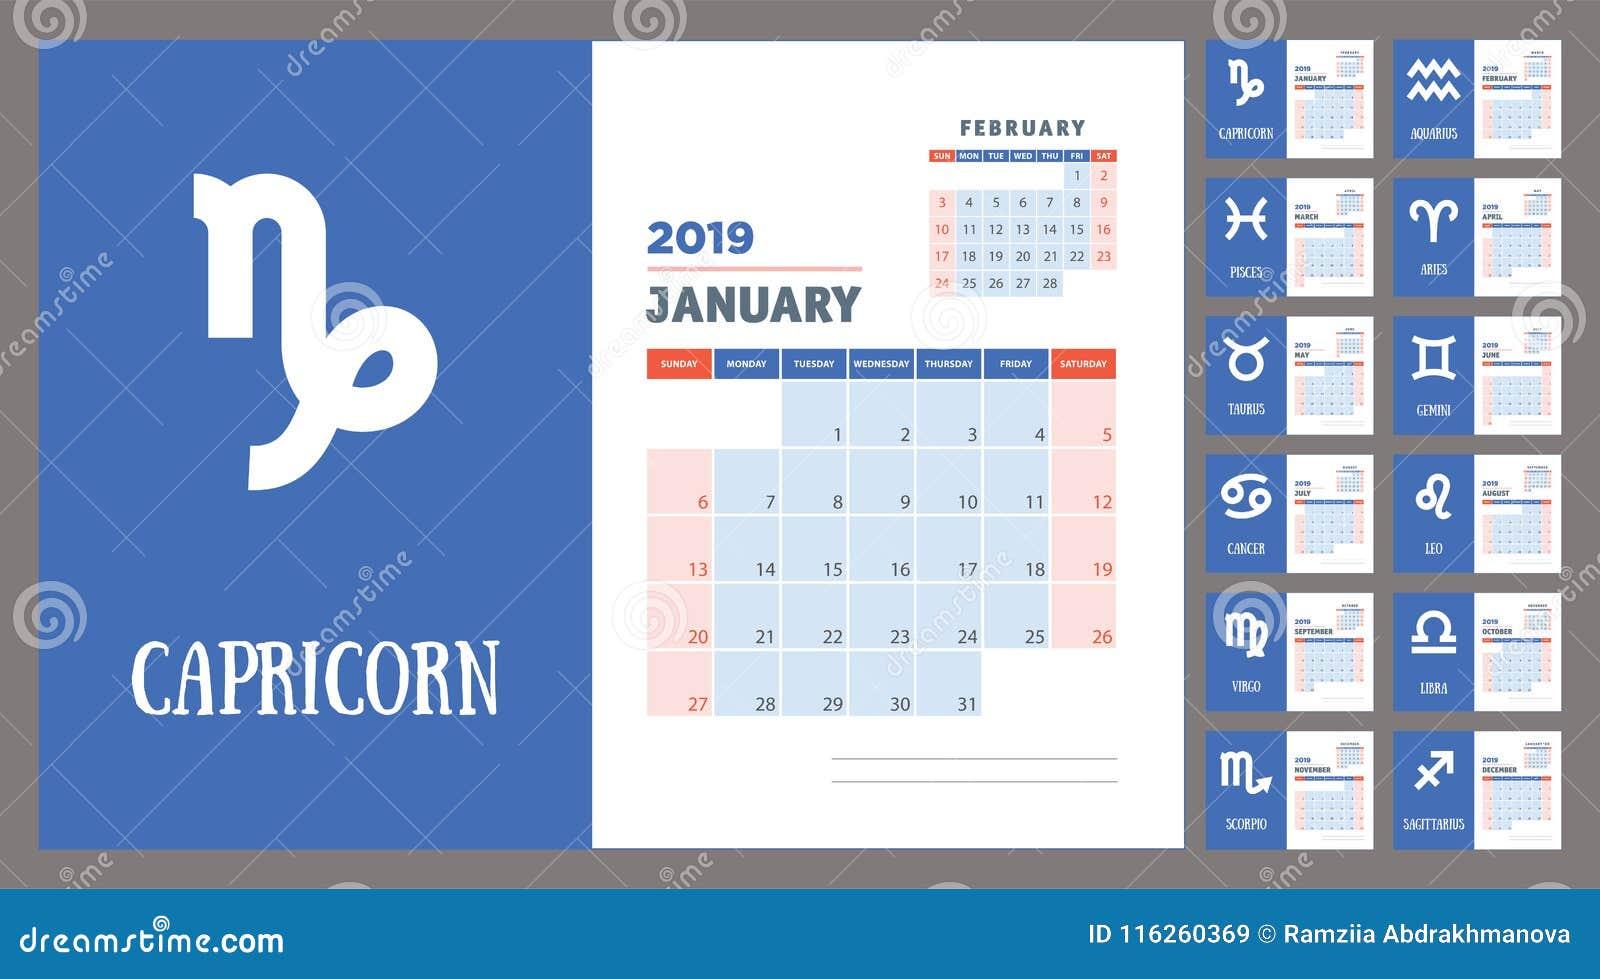 2019 Zodiac Planner  Vector Callendar  Week Starts On Sunday Stock